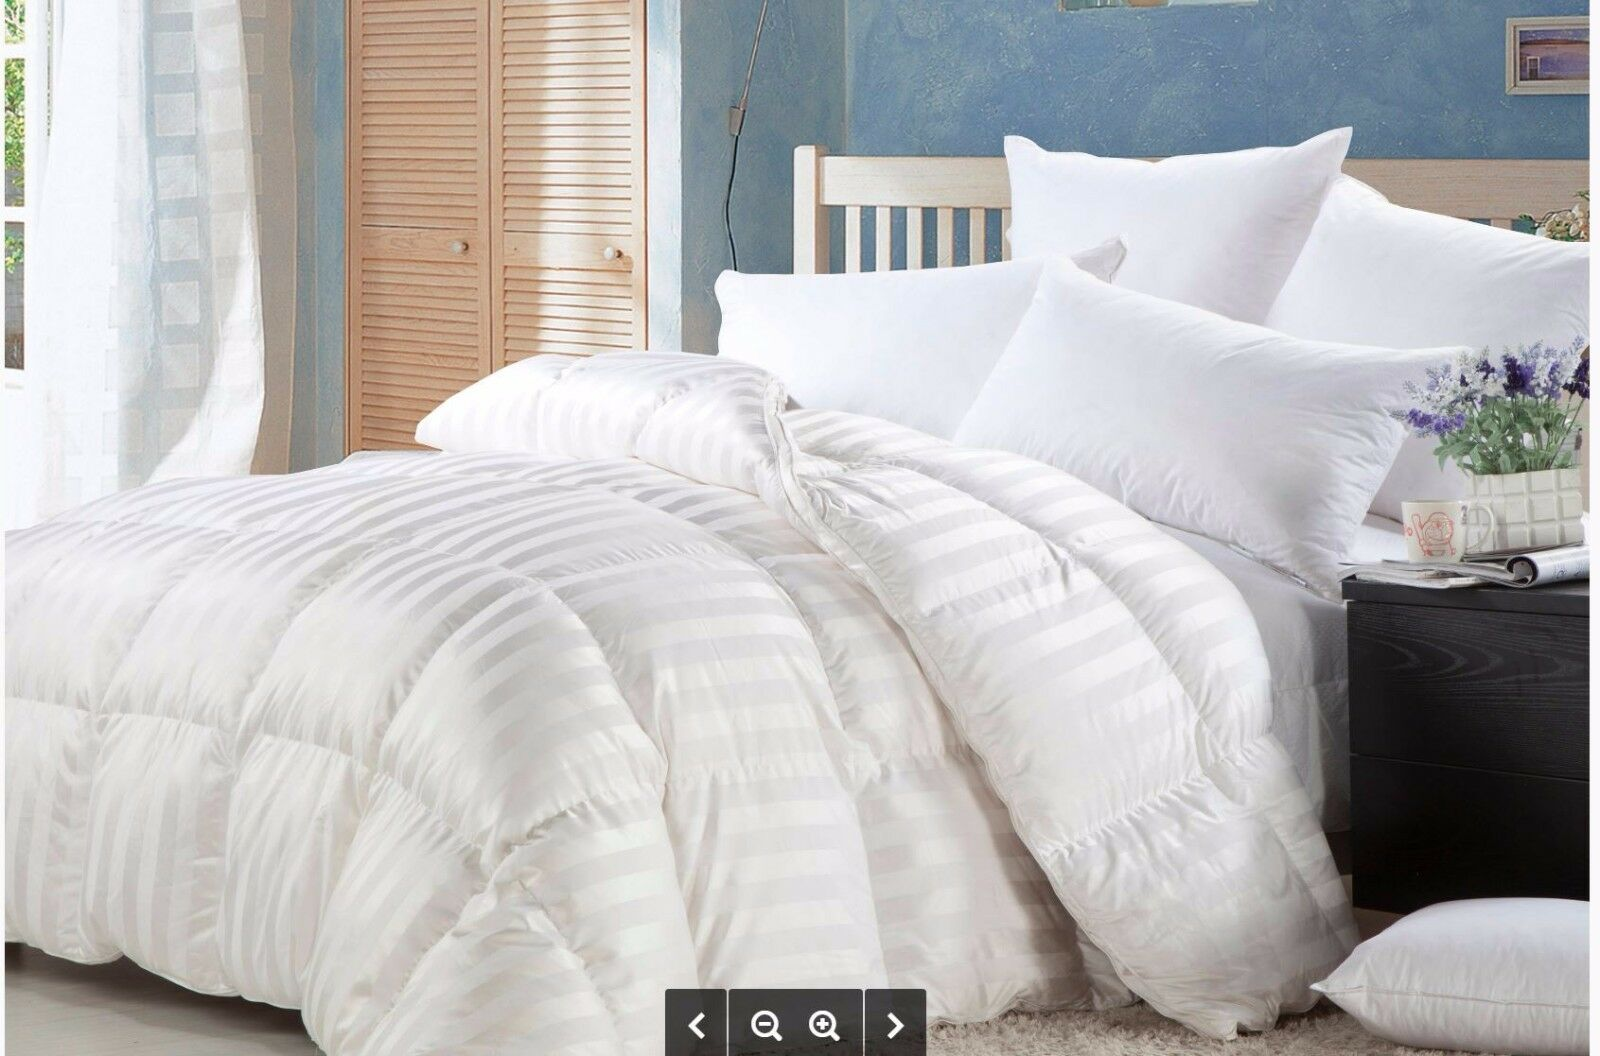 cal king comforter sets luxurious baffle box siberian goose down stripe comforter 1200tc twin queen king - Queen Down Comforter